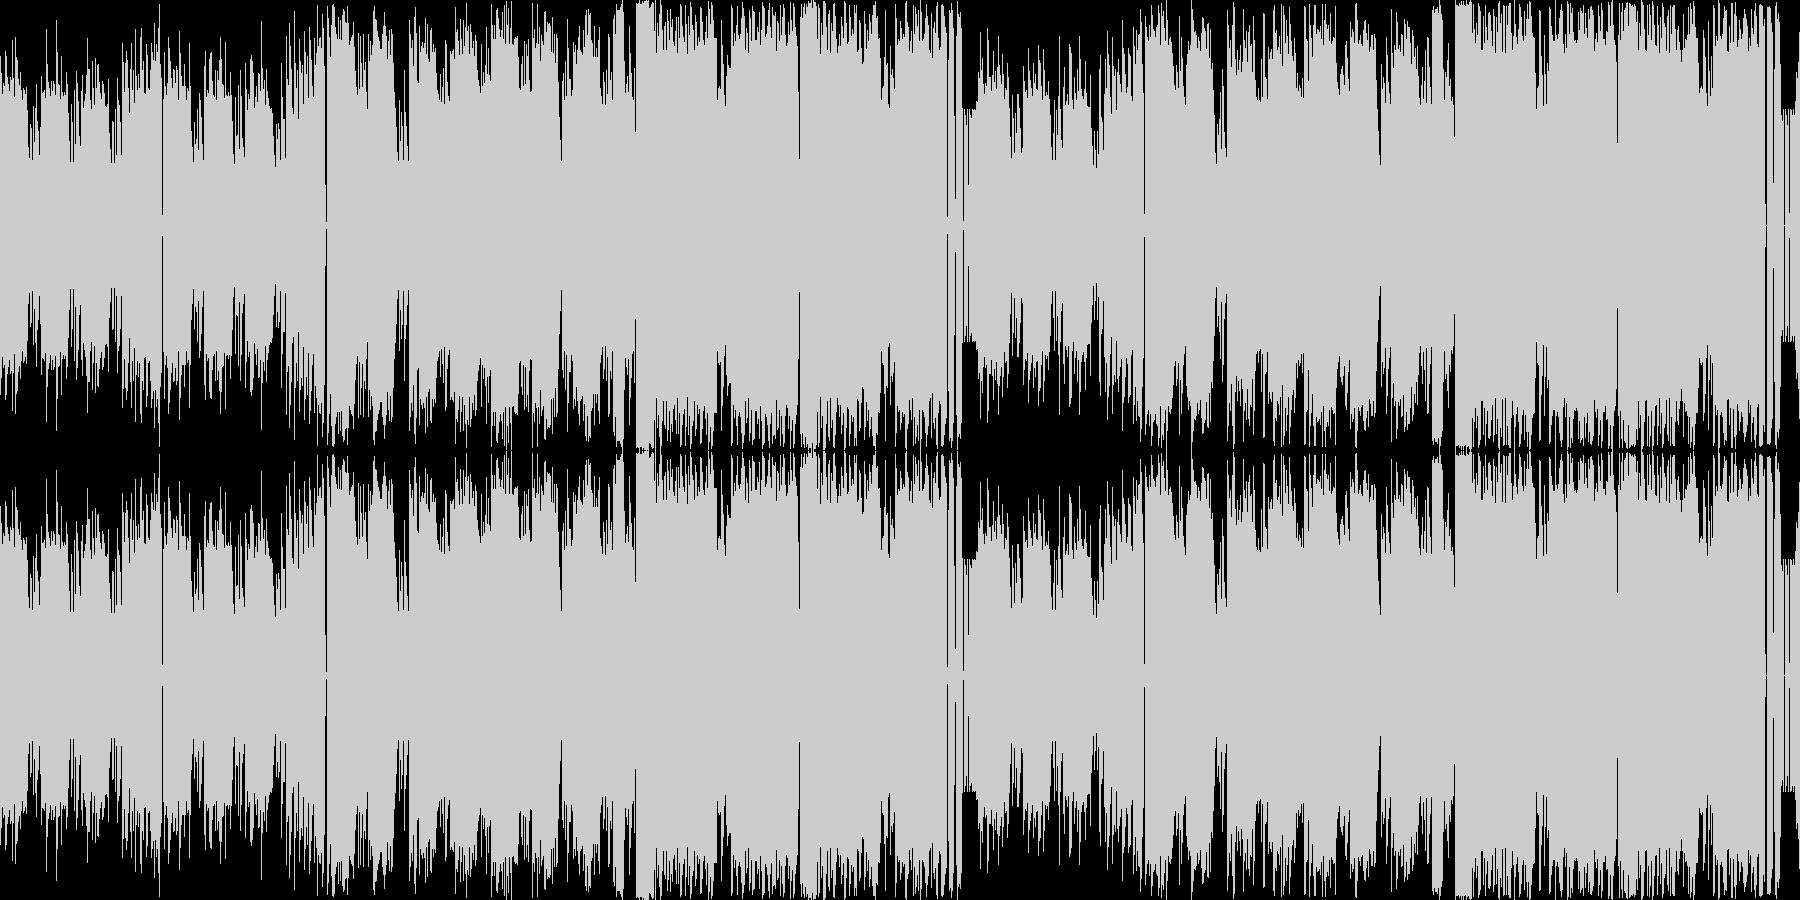 8bitチップチューン:アクション#01の未再生の波形